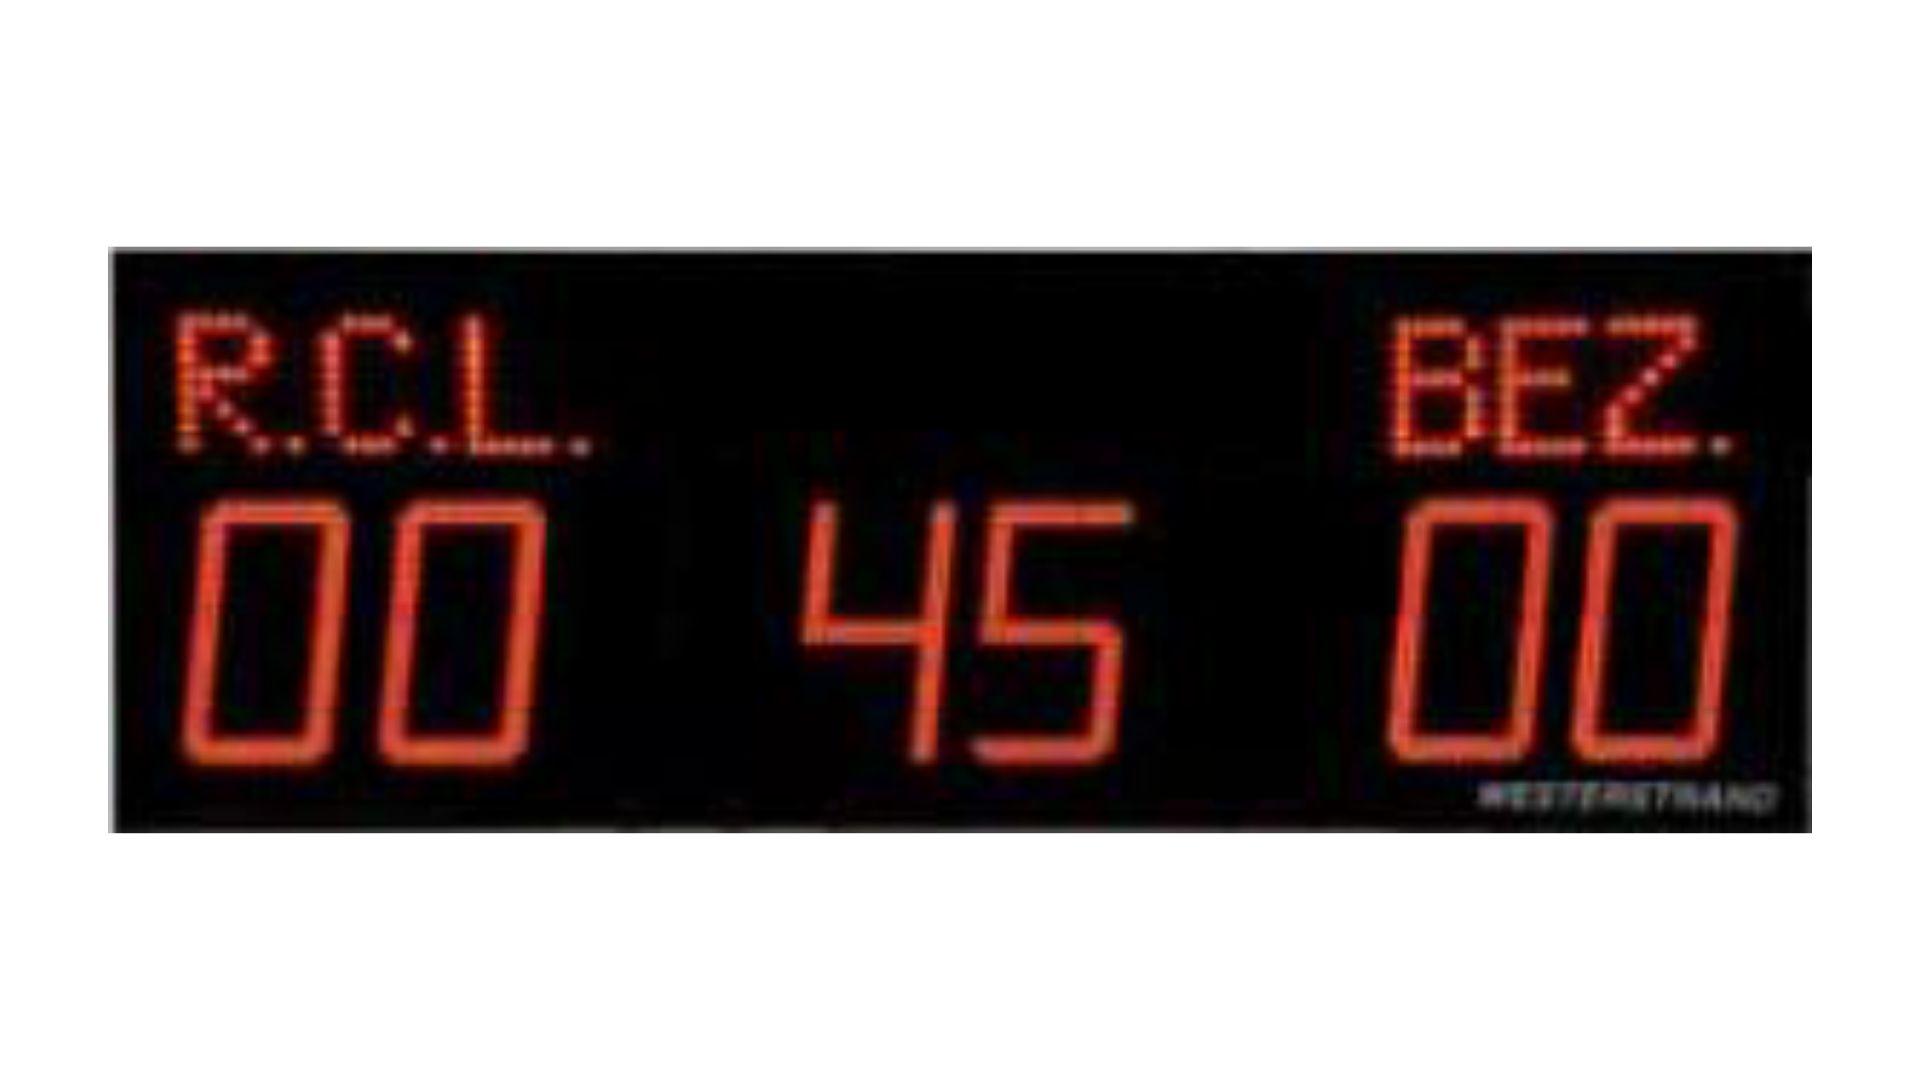 digitaal scorebord digits